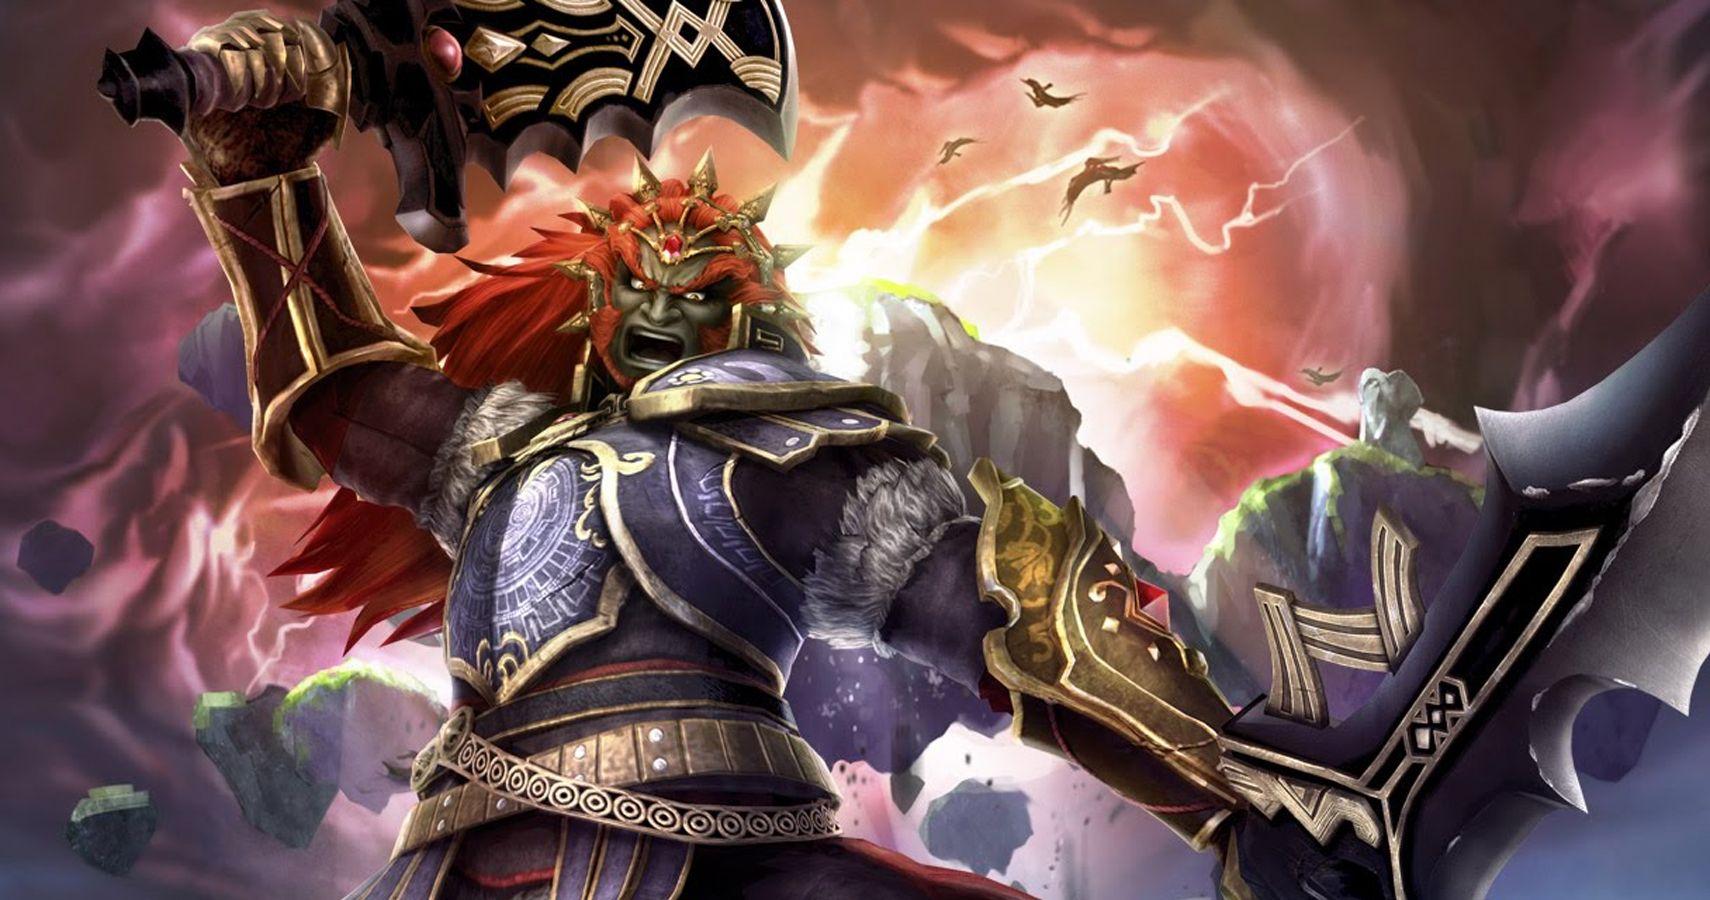 Legend Of Zelda: Every Villain From Weakest To Strongest